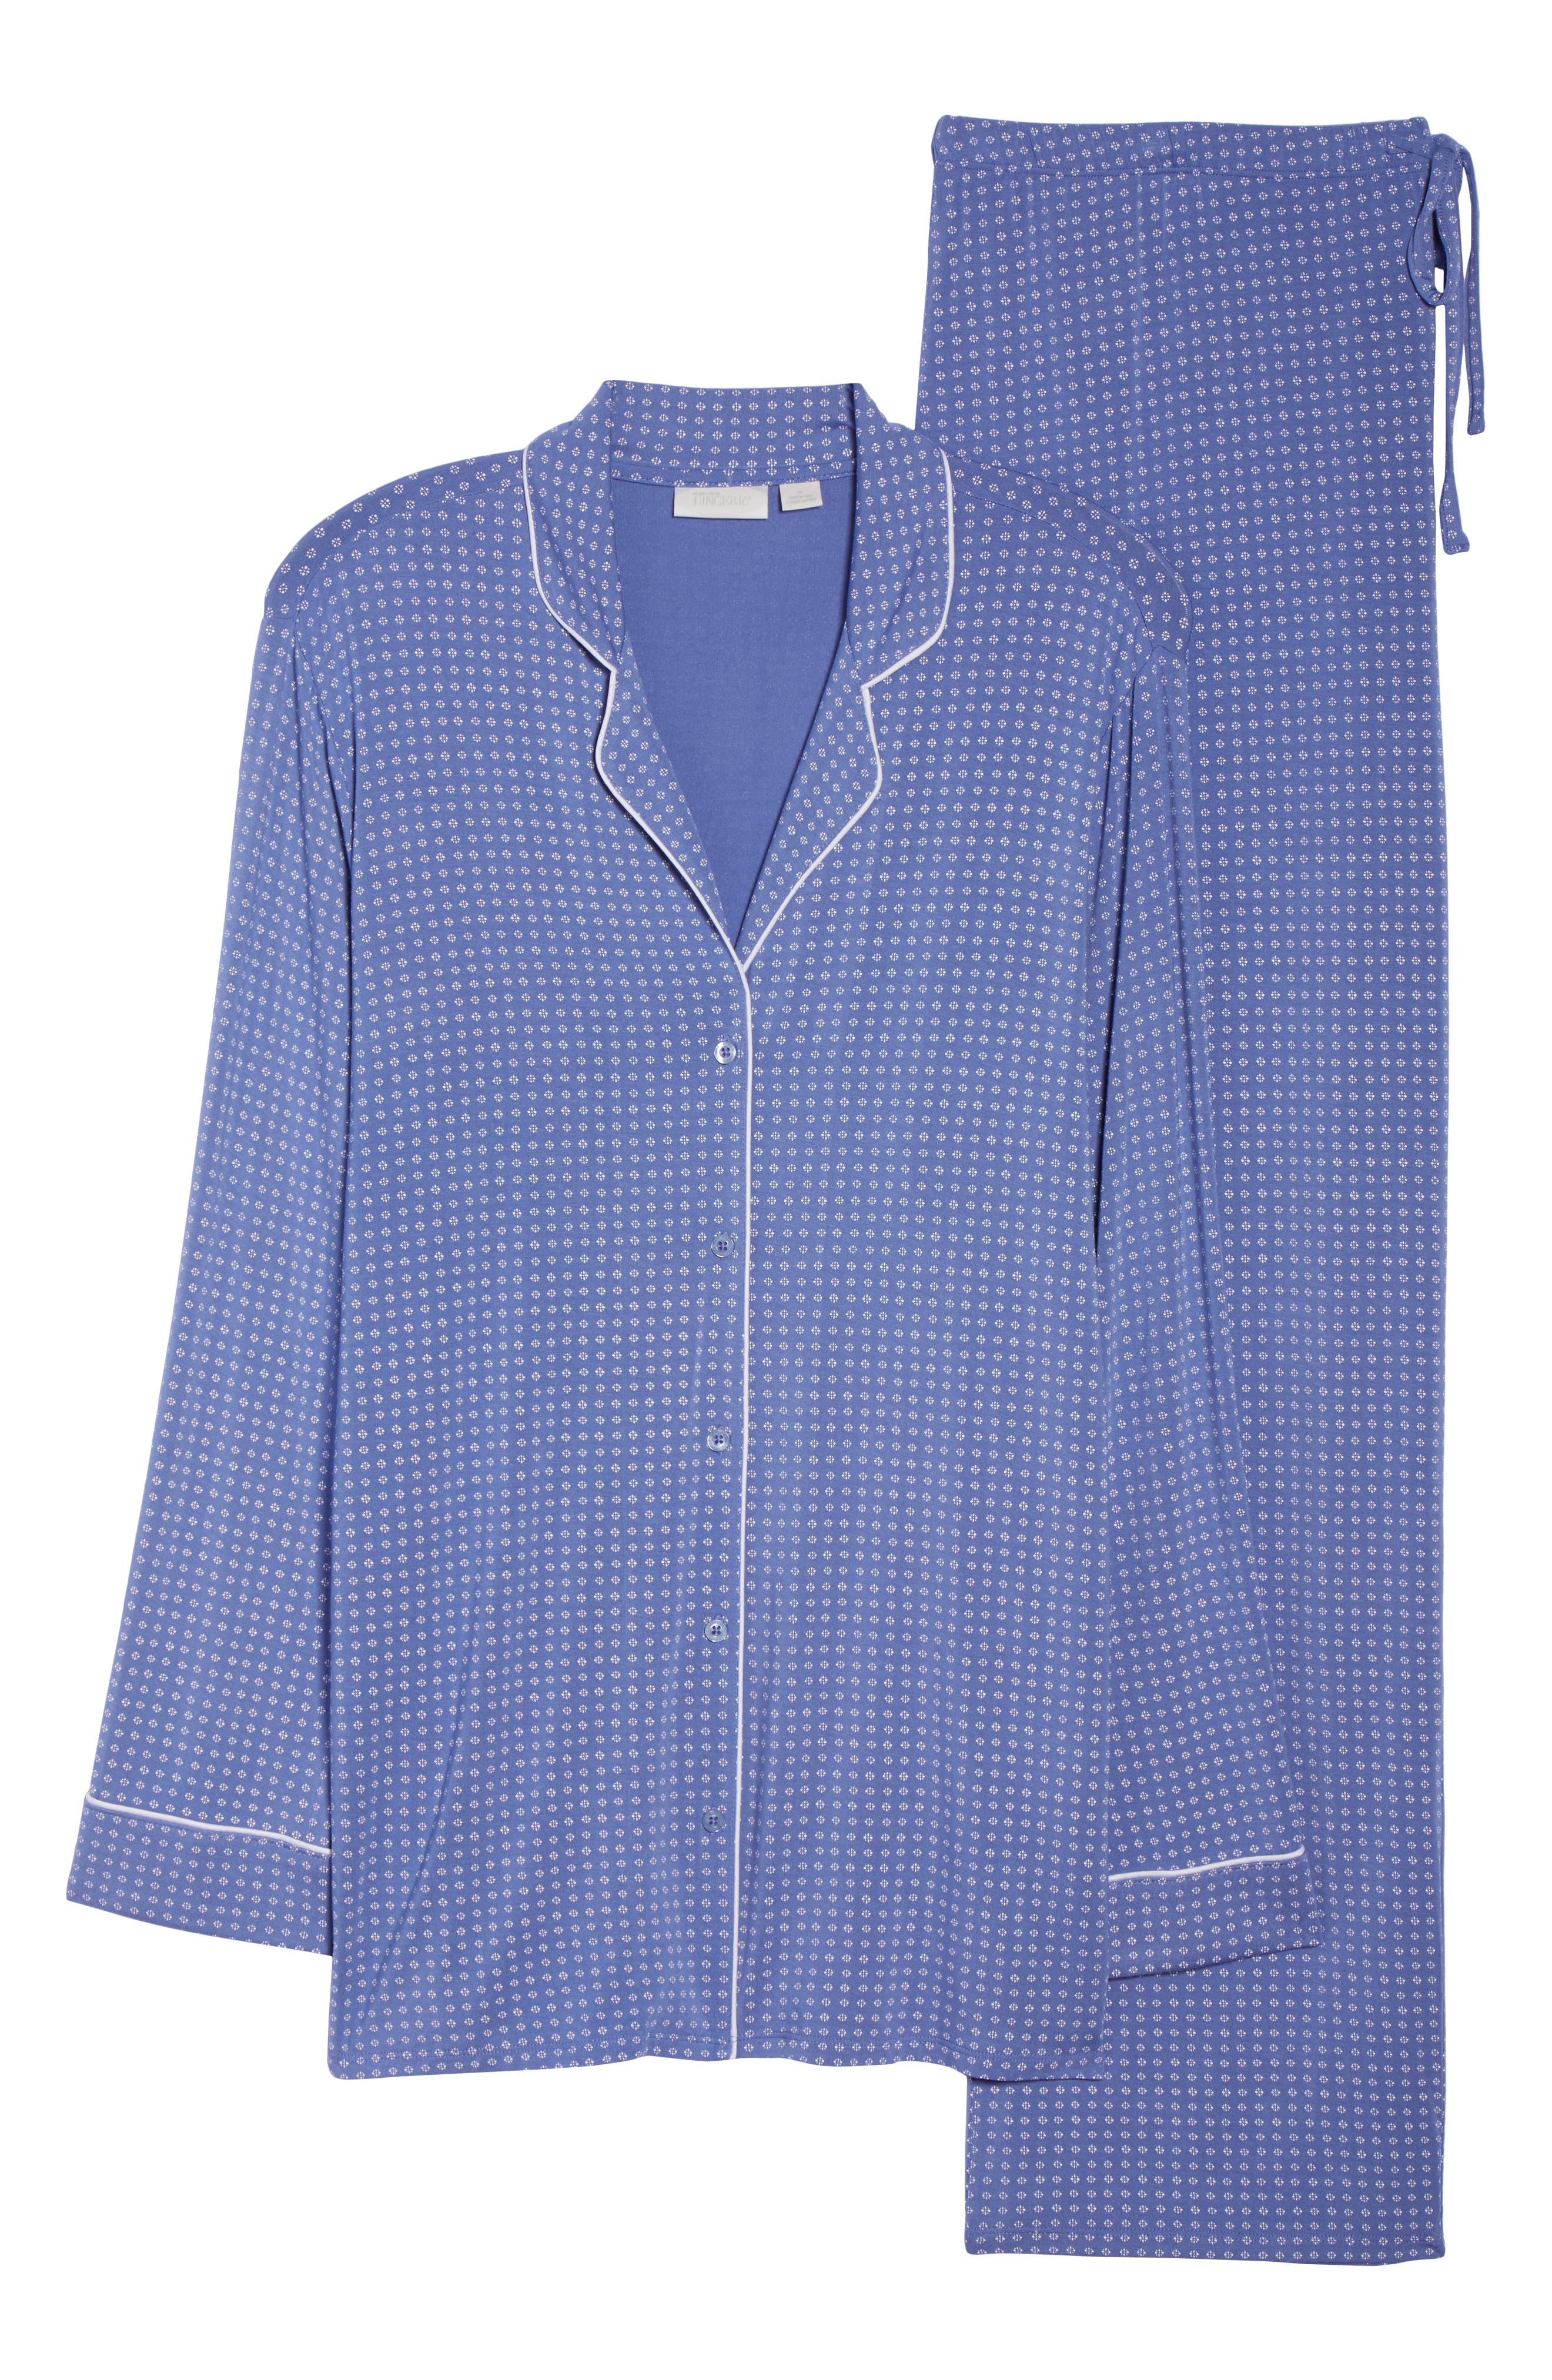 'Moonlight' Pajamas,                             Alternate thumbnail 6, color,                             Blue Denim Geo